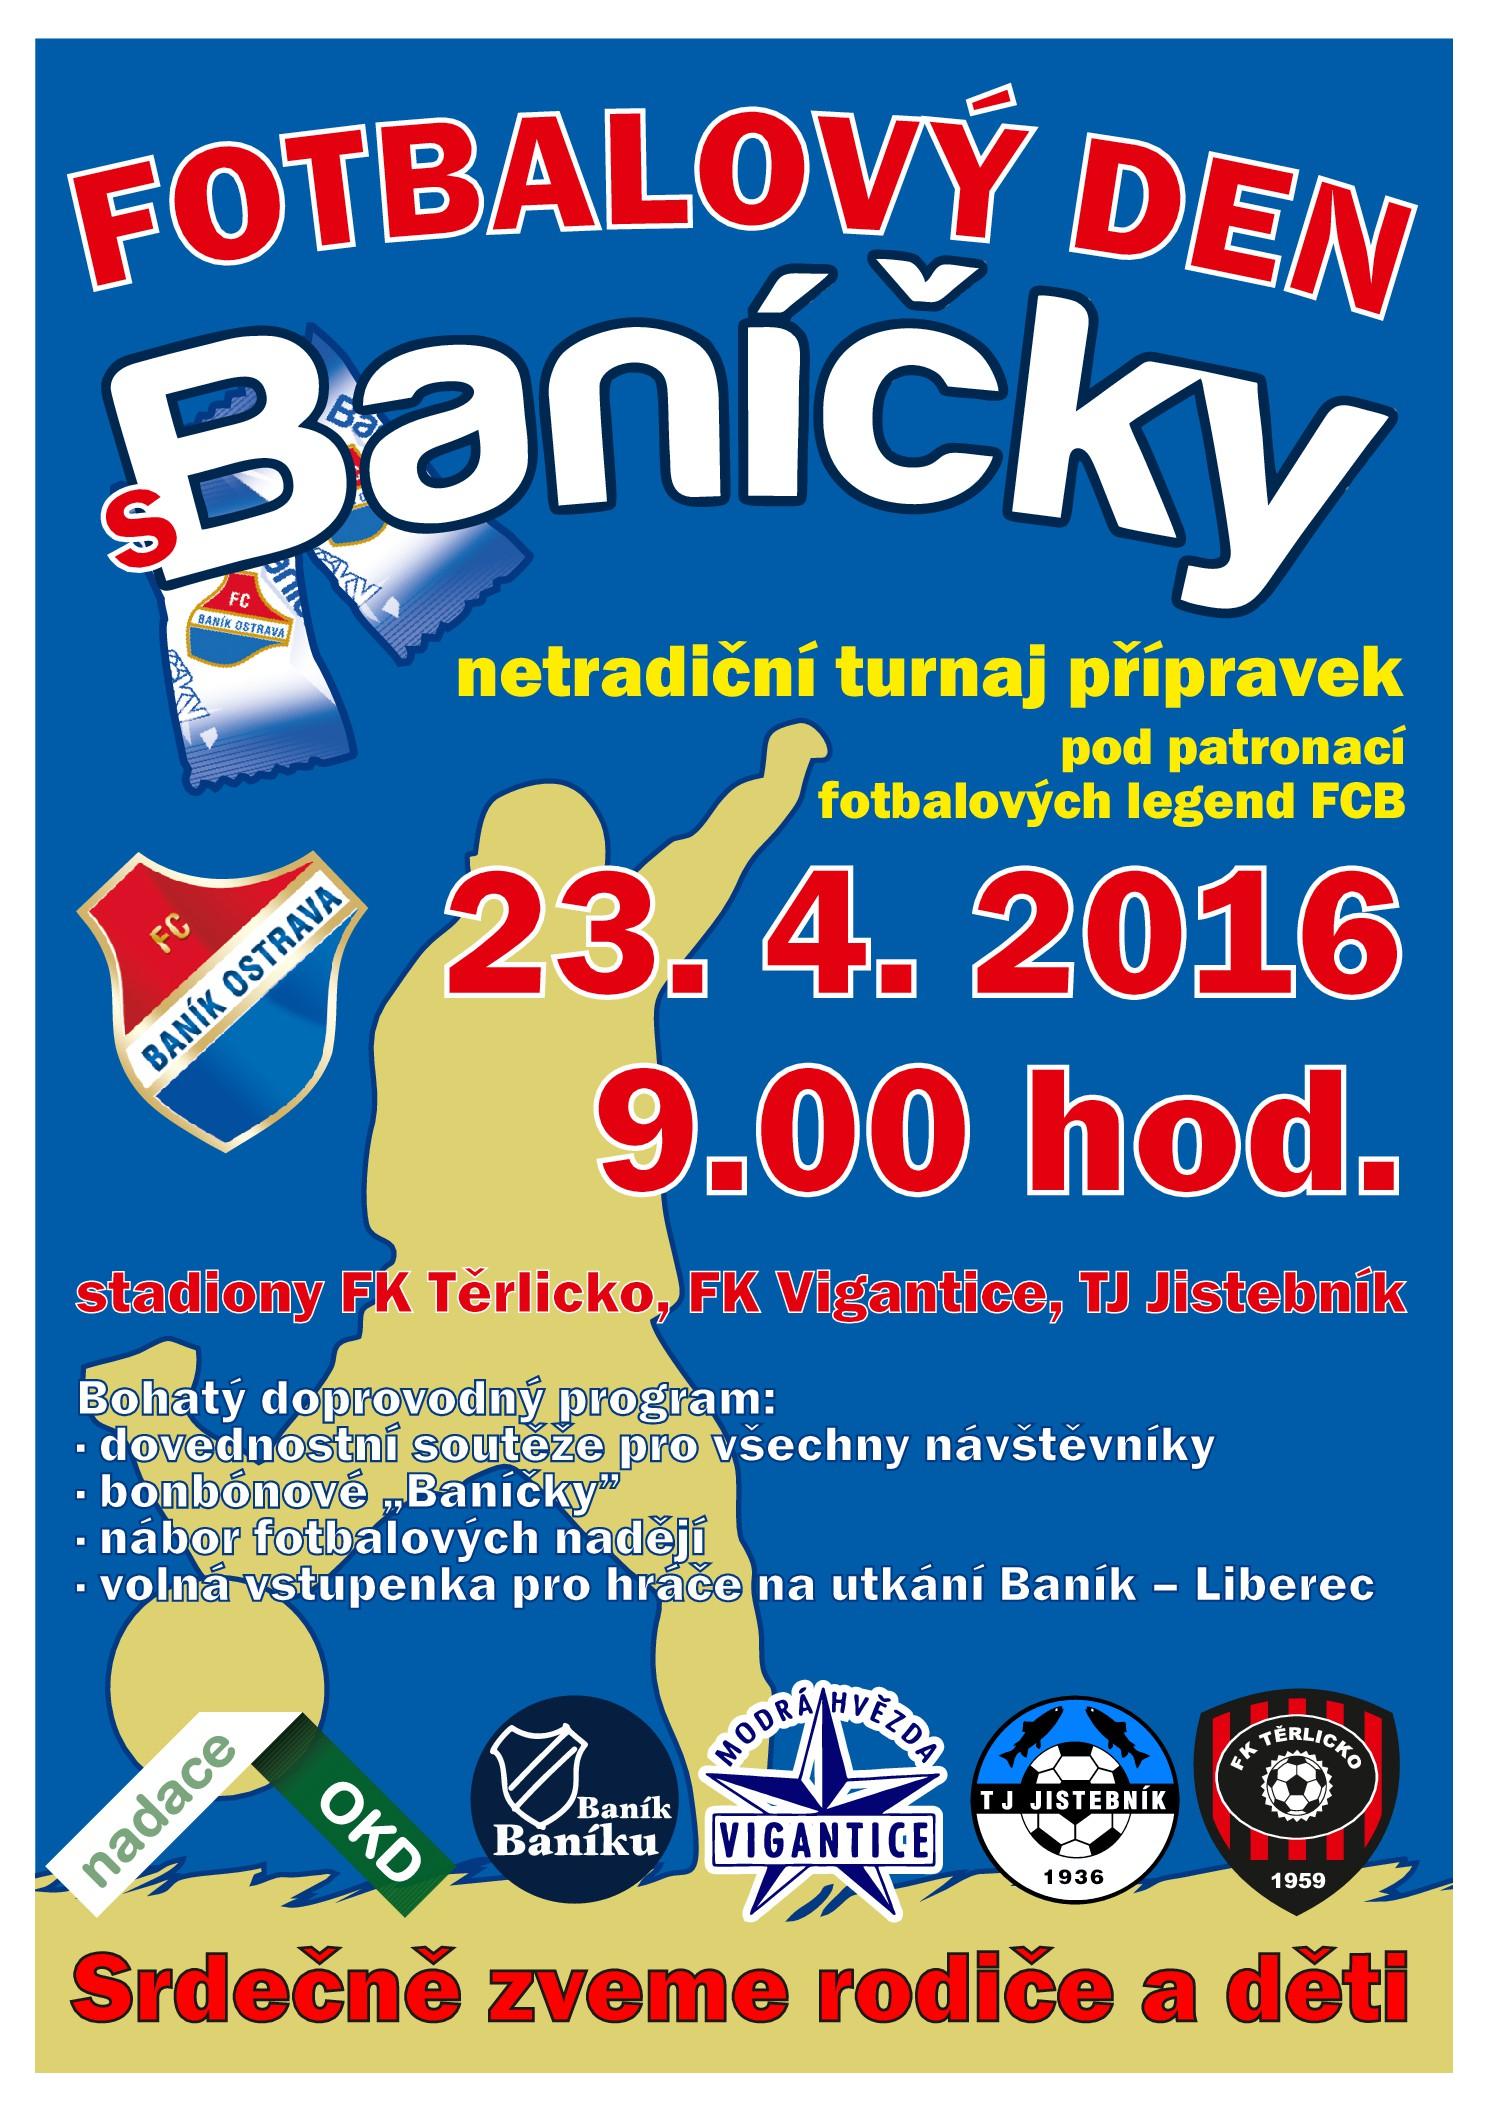 Banicky_15-16_1.jpg (644 KB)